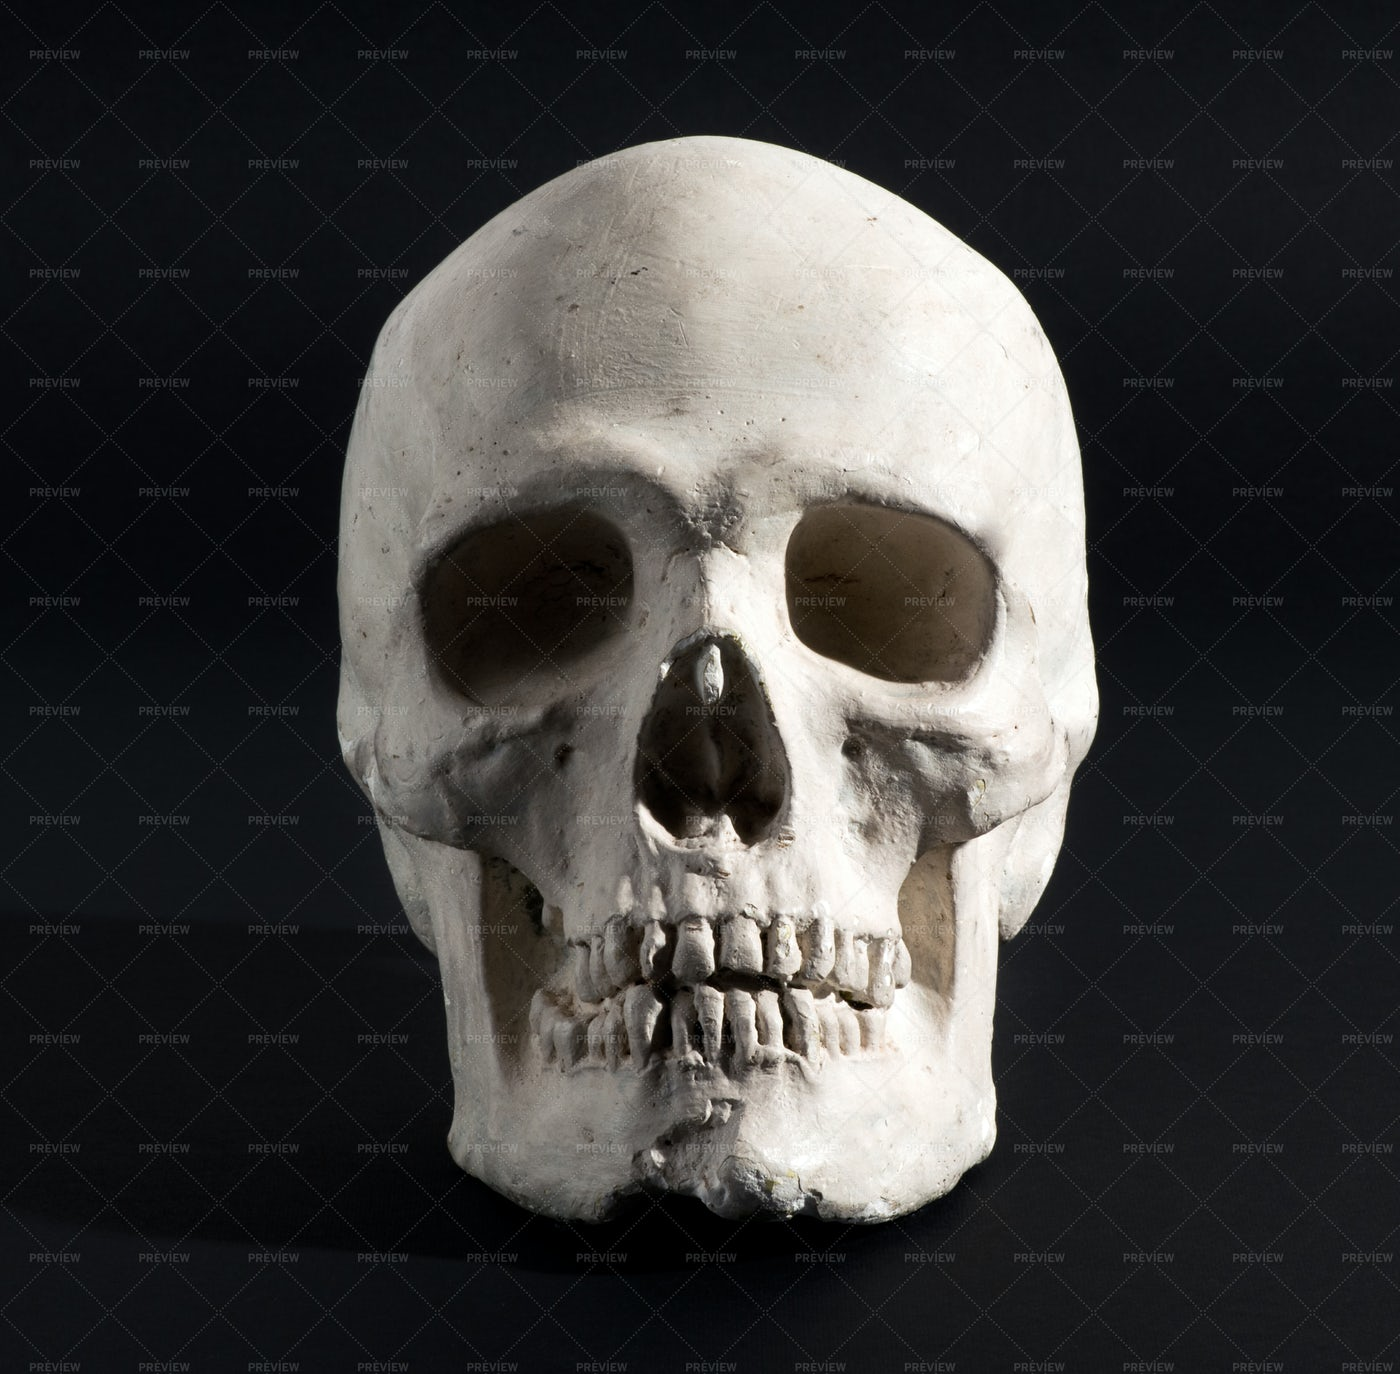 Human Skull On A Black: Stock Photos